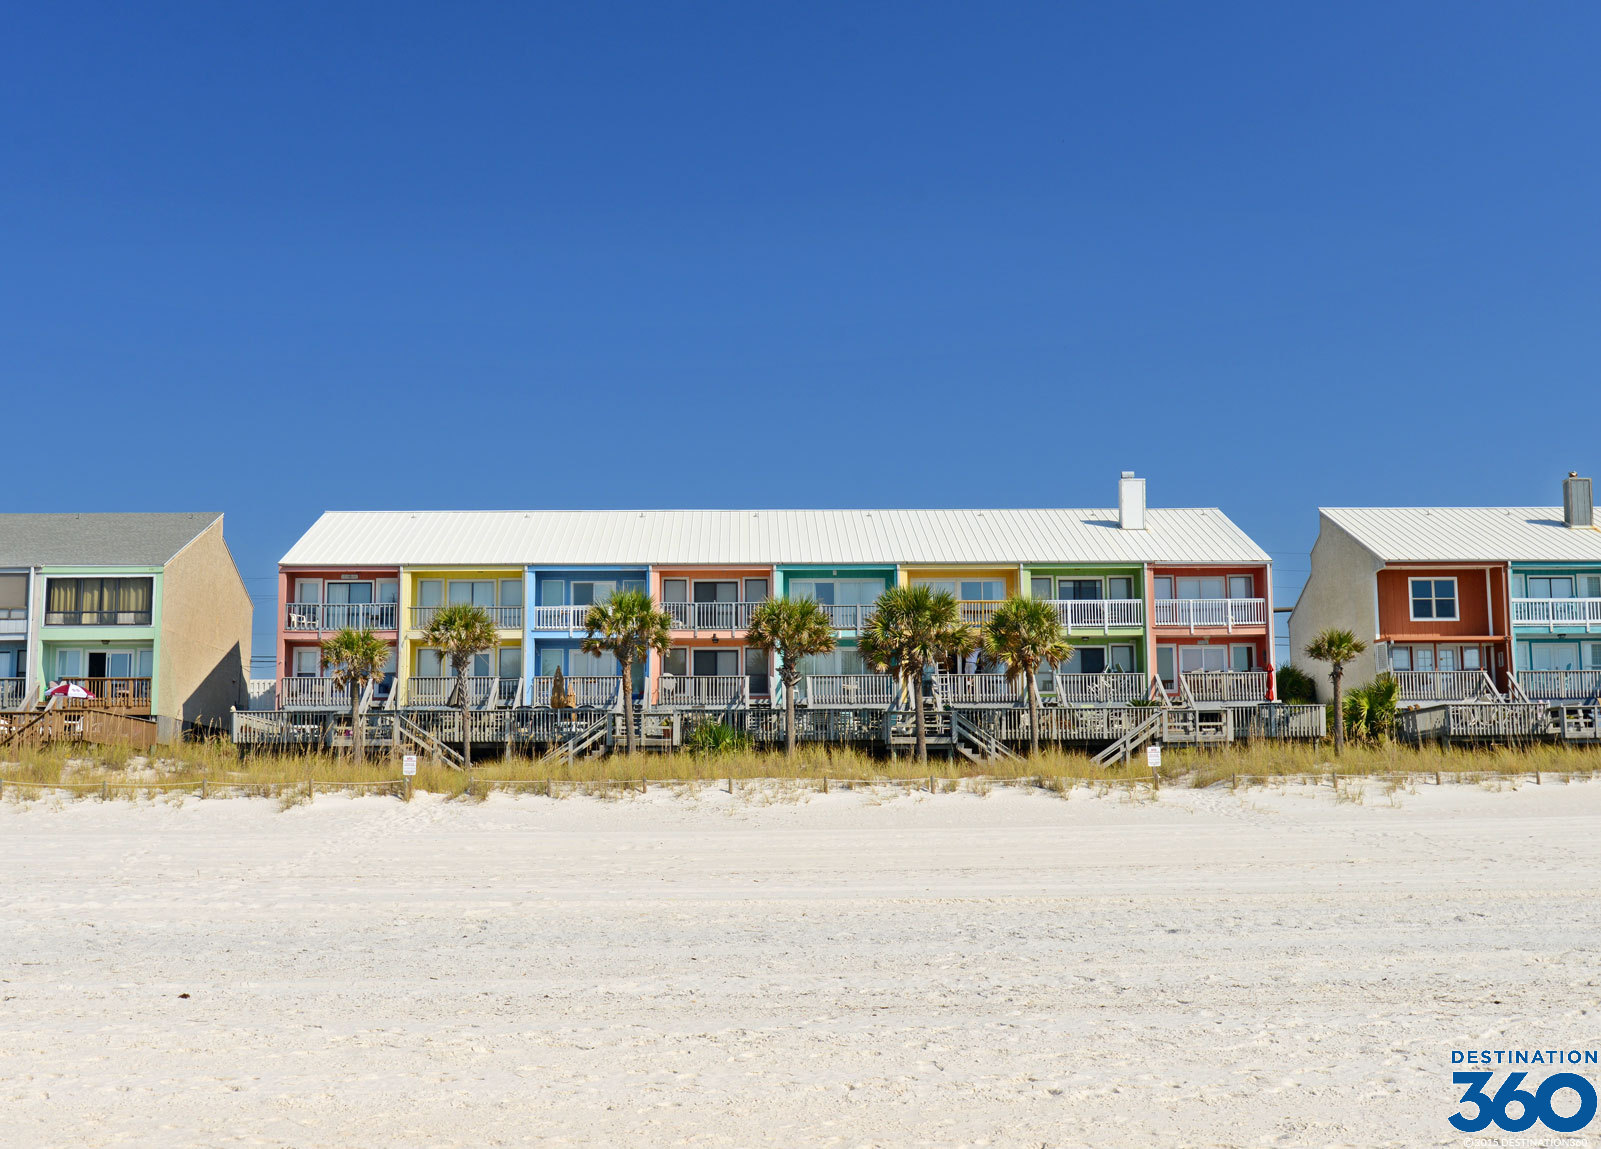 Vacation Rentals Palm Desert Ca